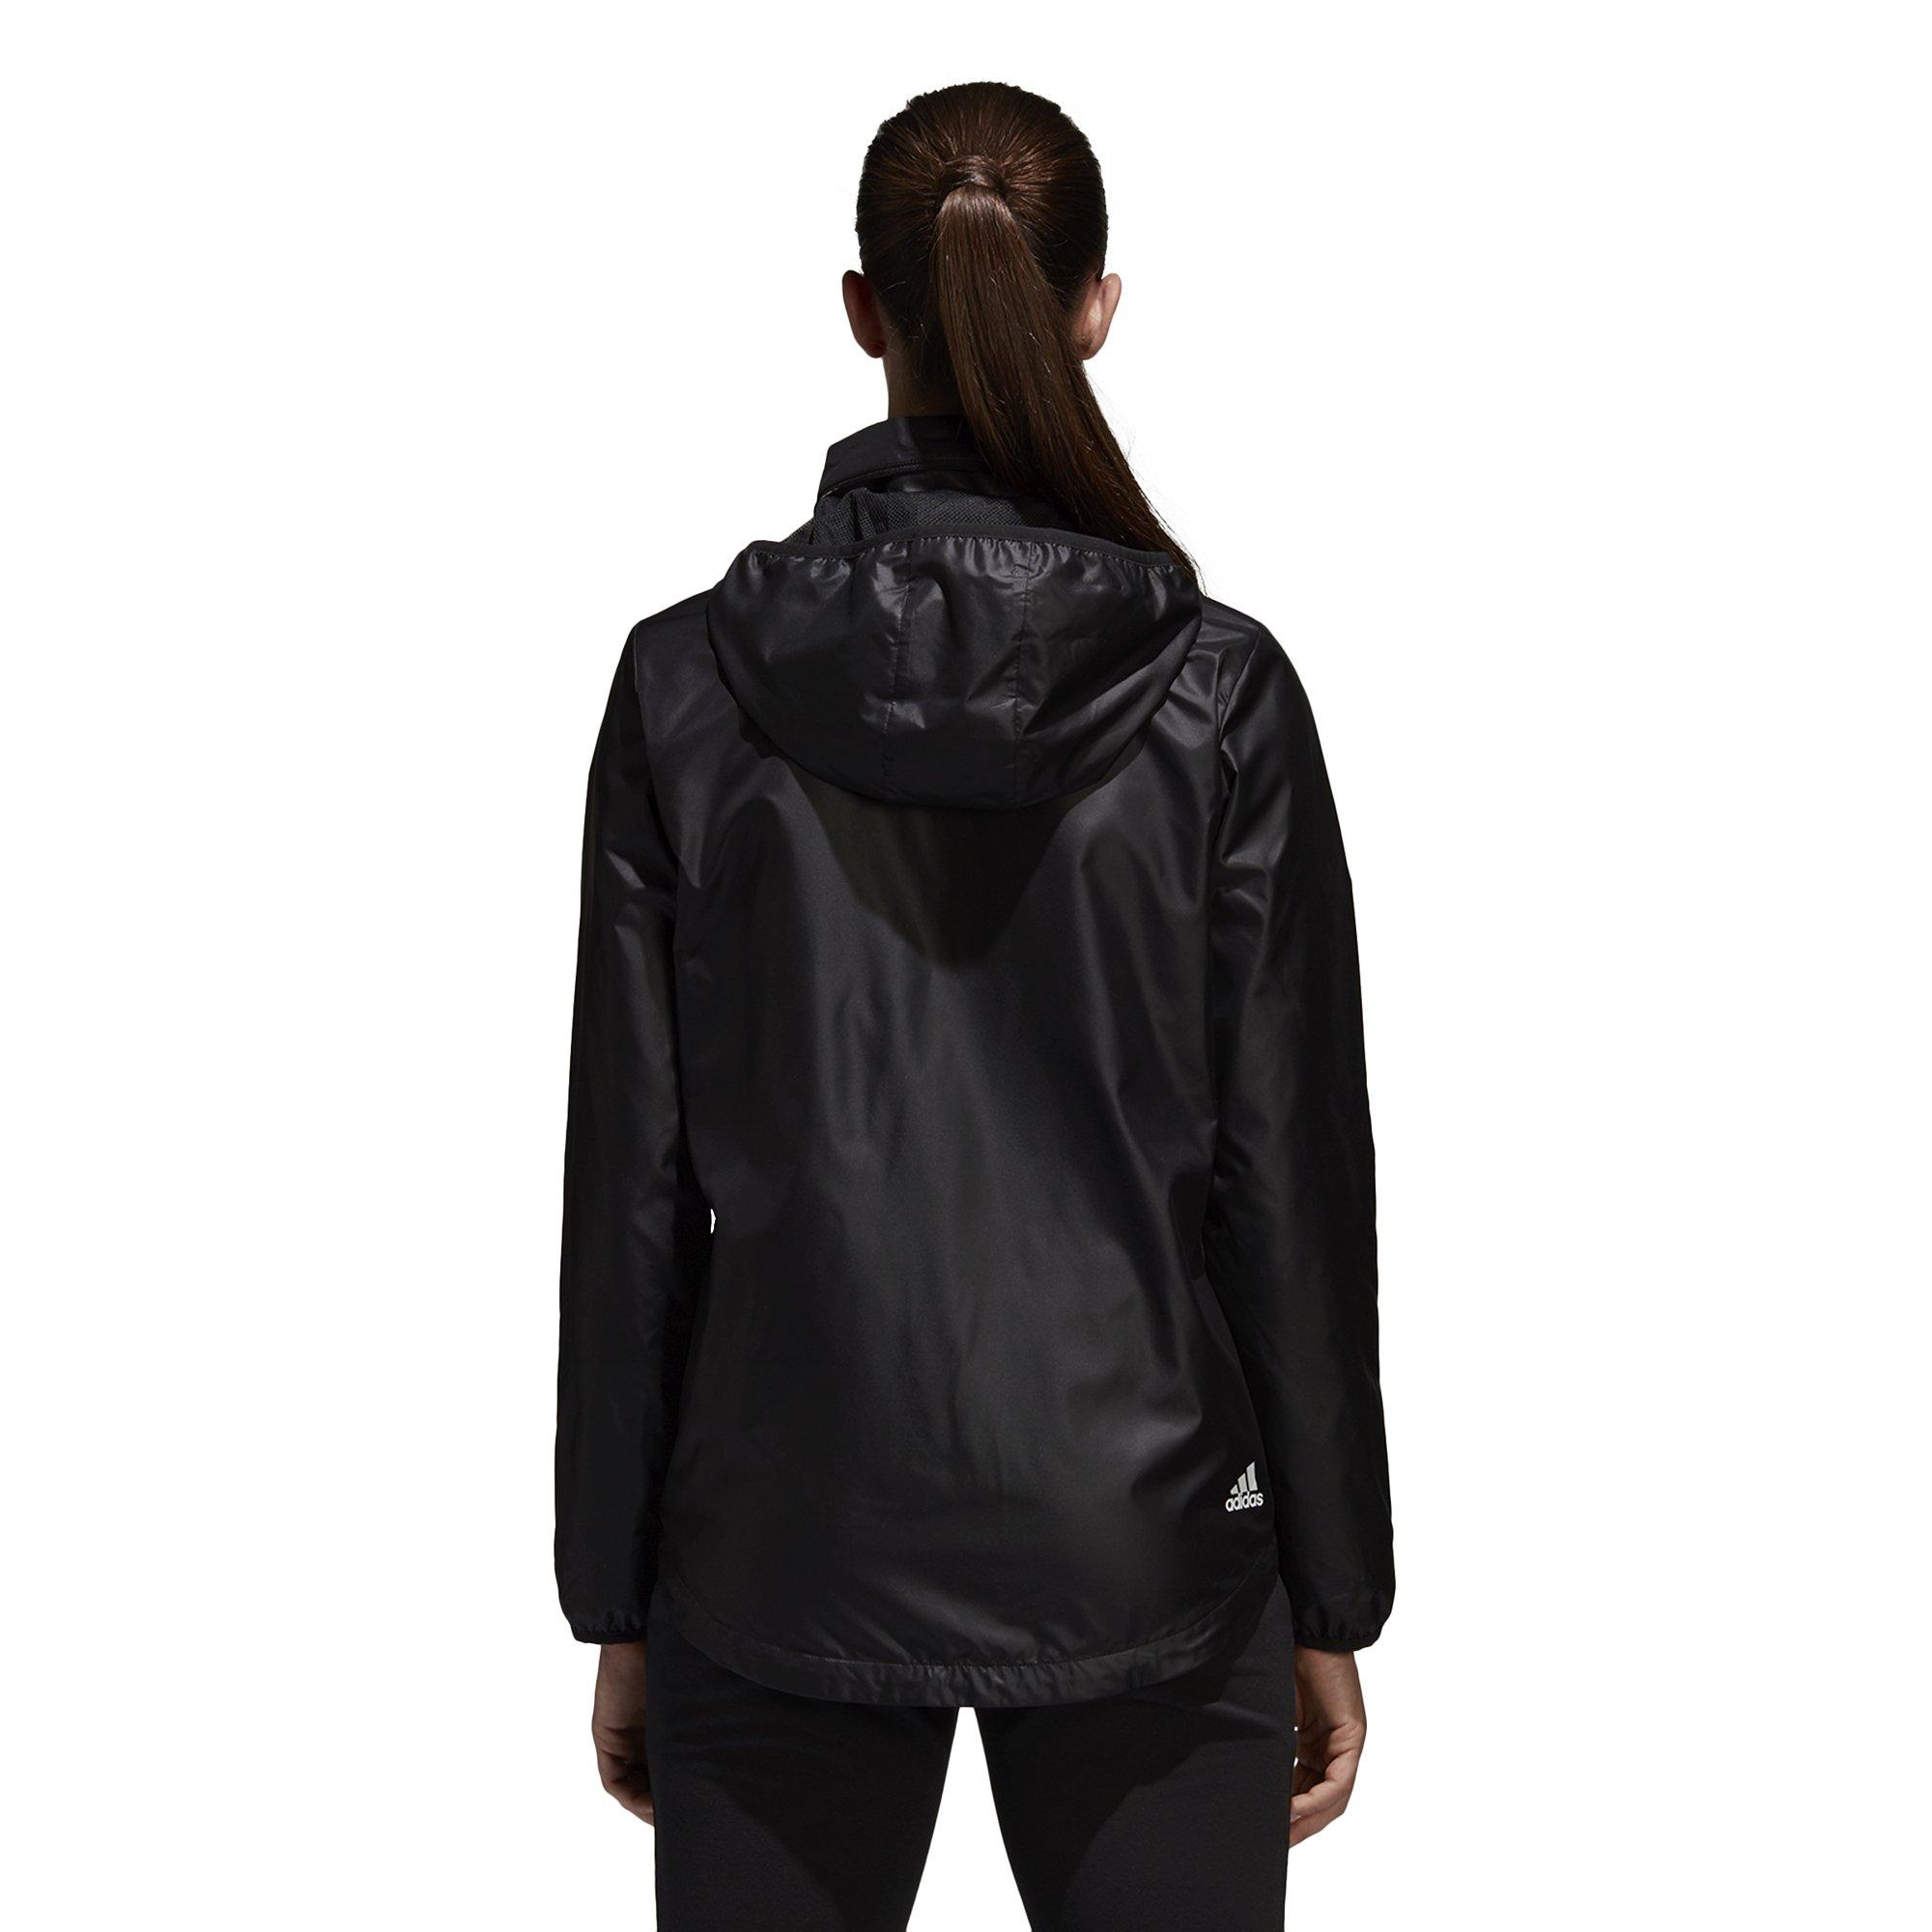 adidas Women's Linear Windbreaker Jacket, Black, Large by adidas (Image #6)